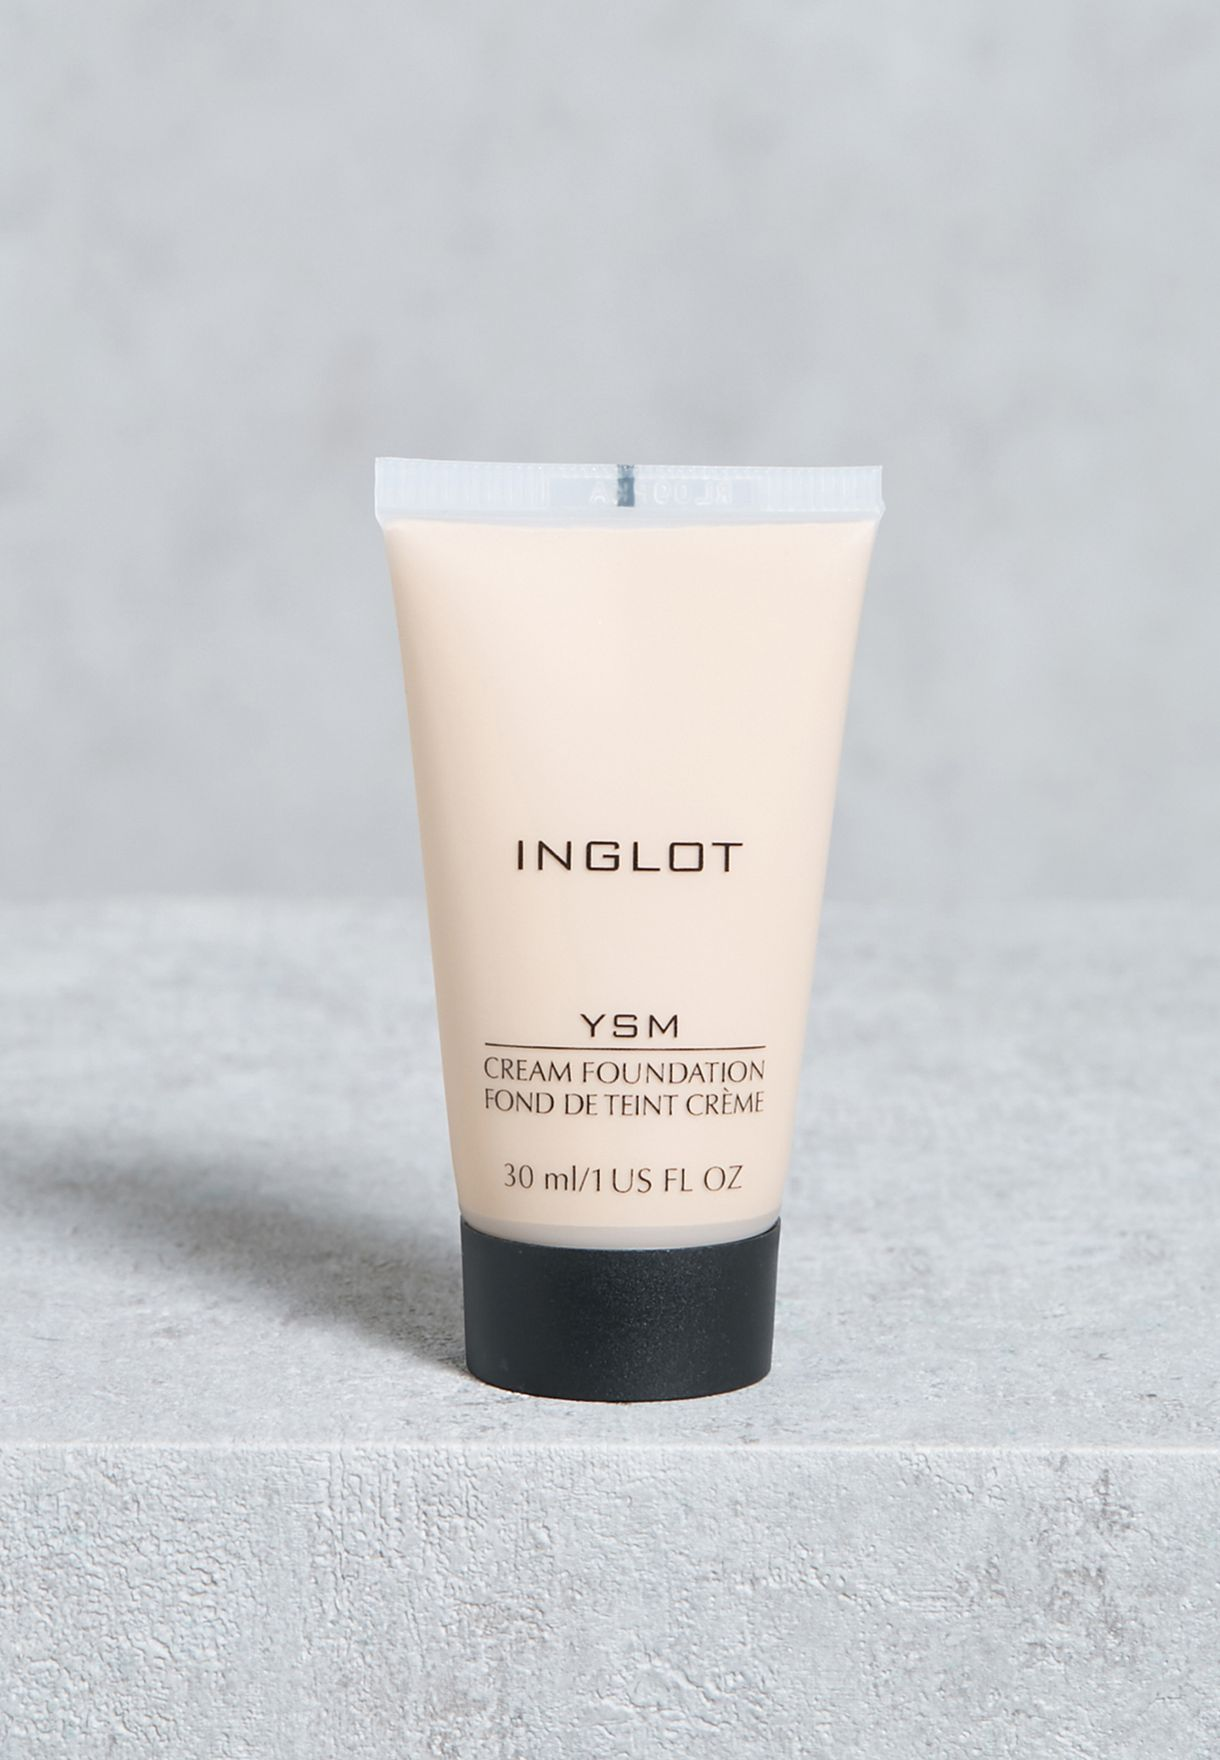 Ysm Cream Foundation #41